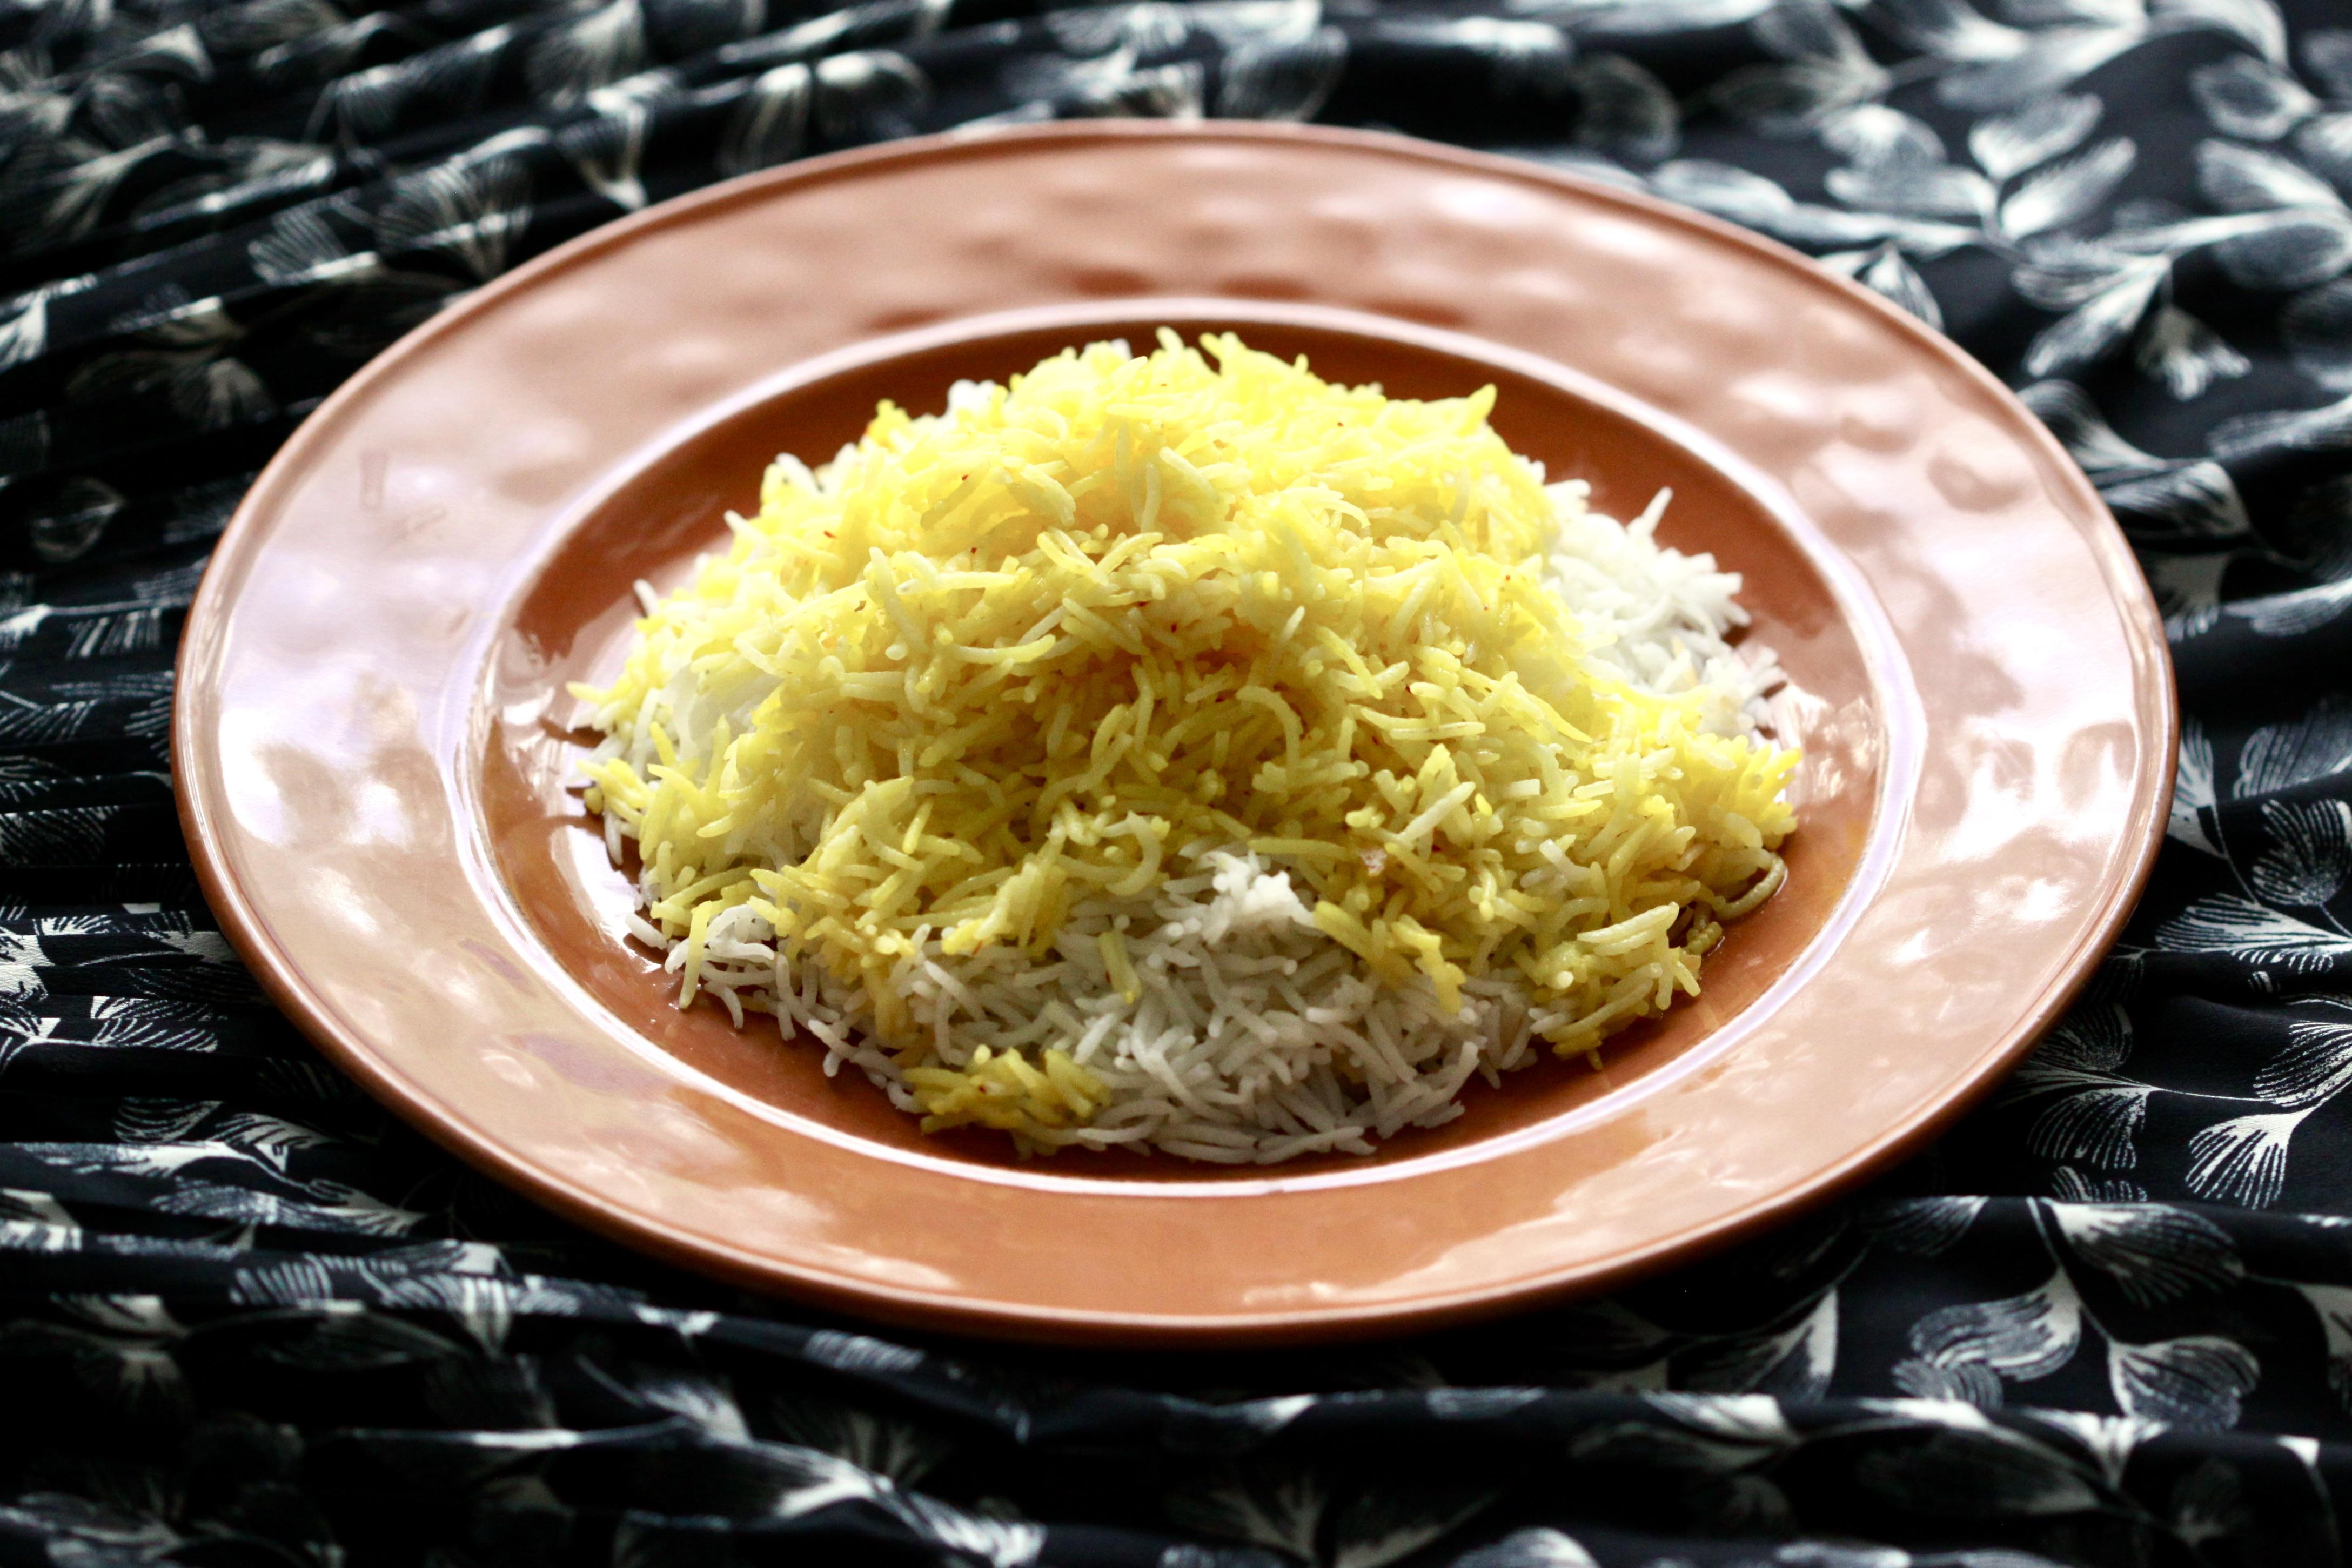 A plate of saffron rice